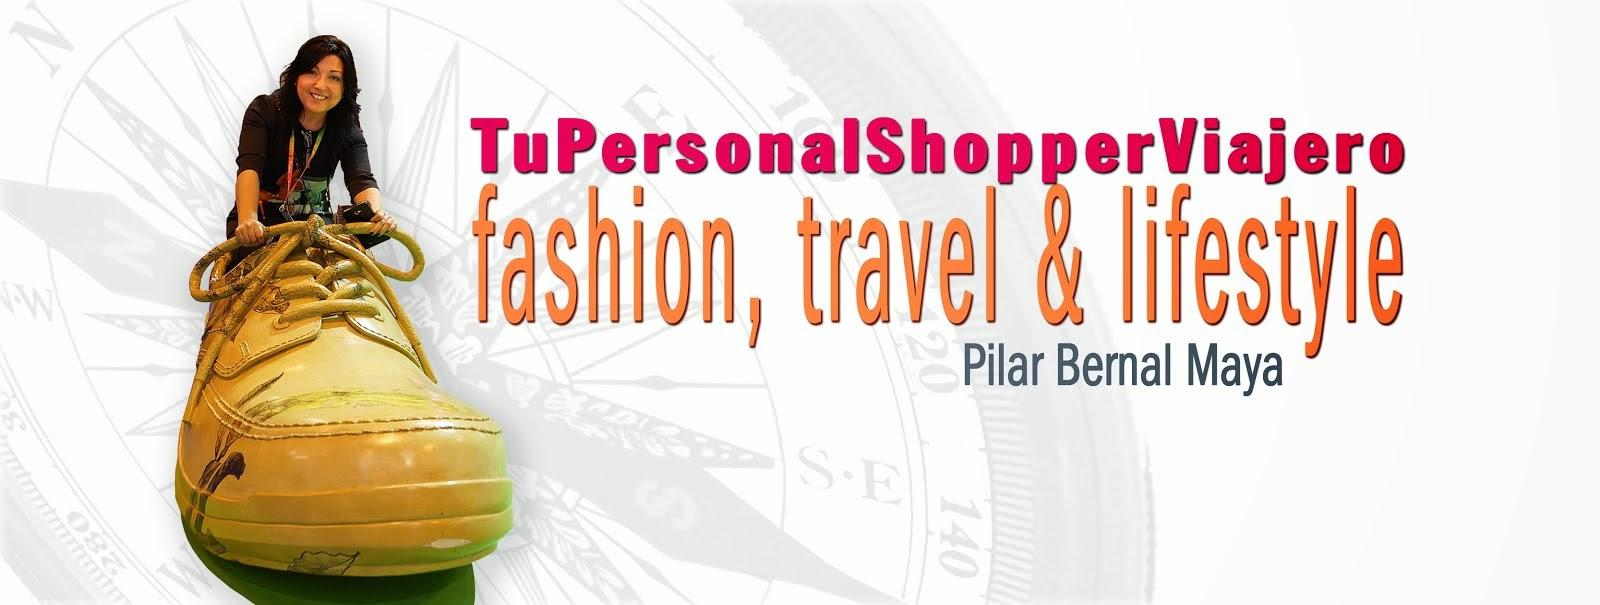 Blog Tupersonalshopperviajero - Moda Viajes Belleza Lifestyle